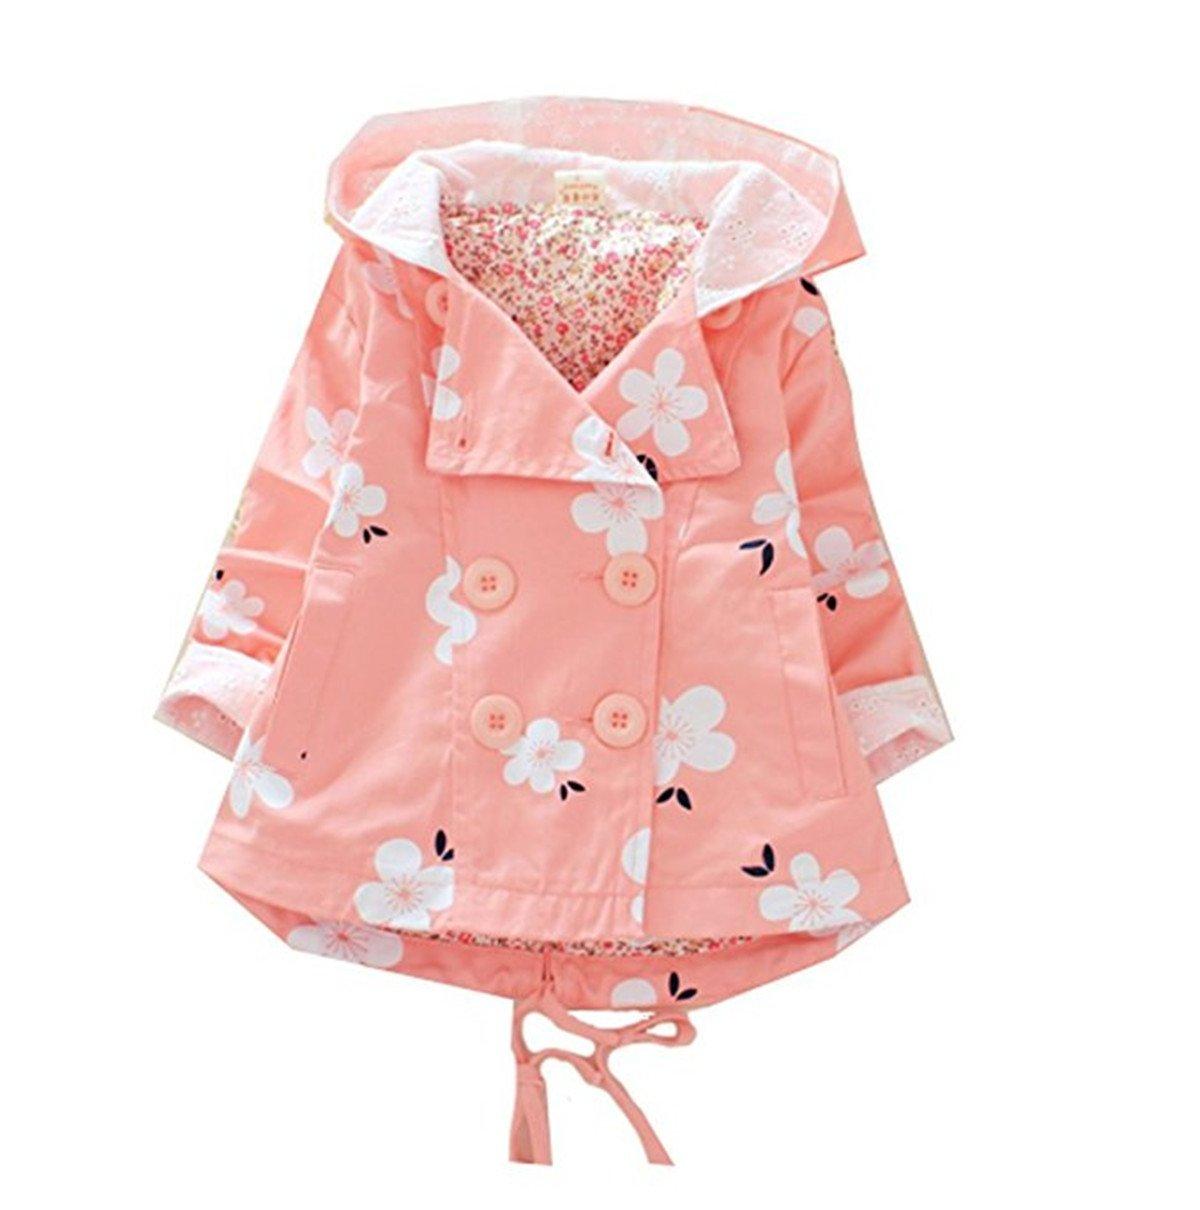 Baby Kid Little Girls Spring Fall Polka Flowers Hoodie Wind Proof Jacket Coat Outerwear